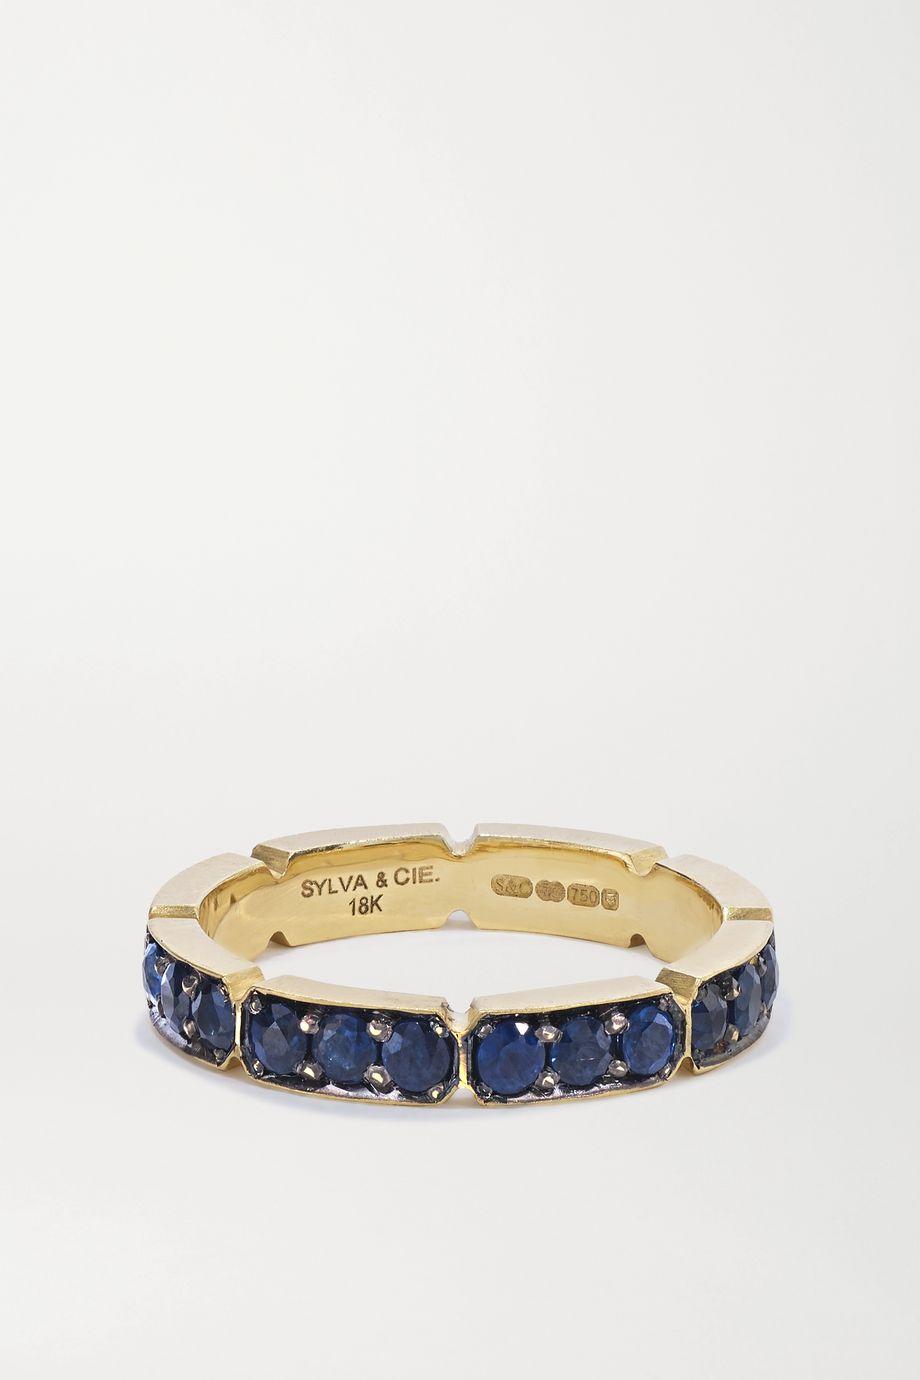 Sylva & Cie 18-karat gold sapphire ring